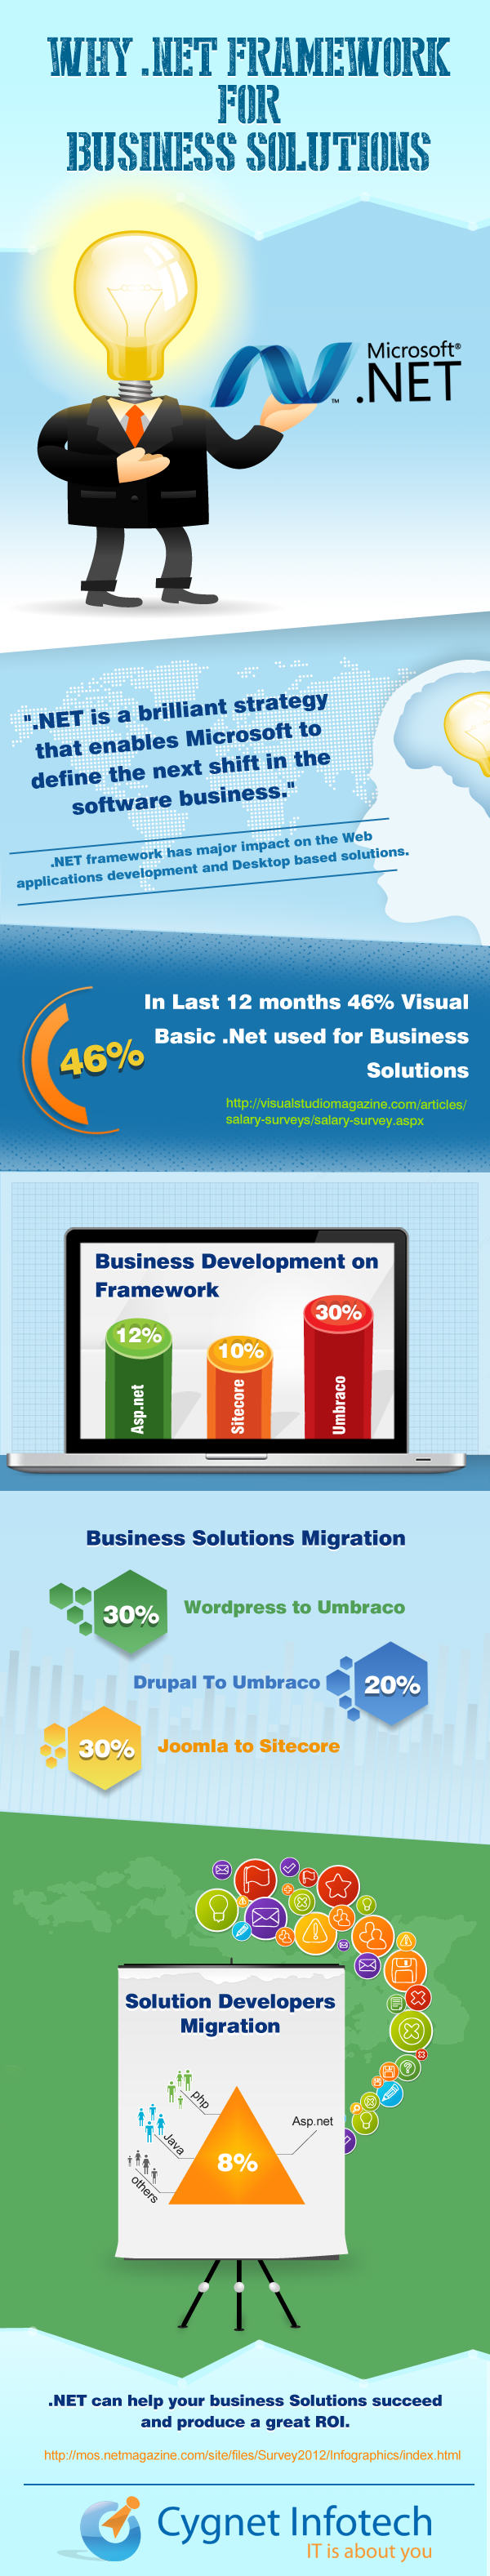 DotNet Infographic